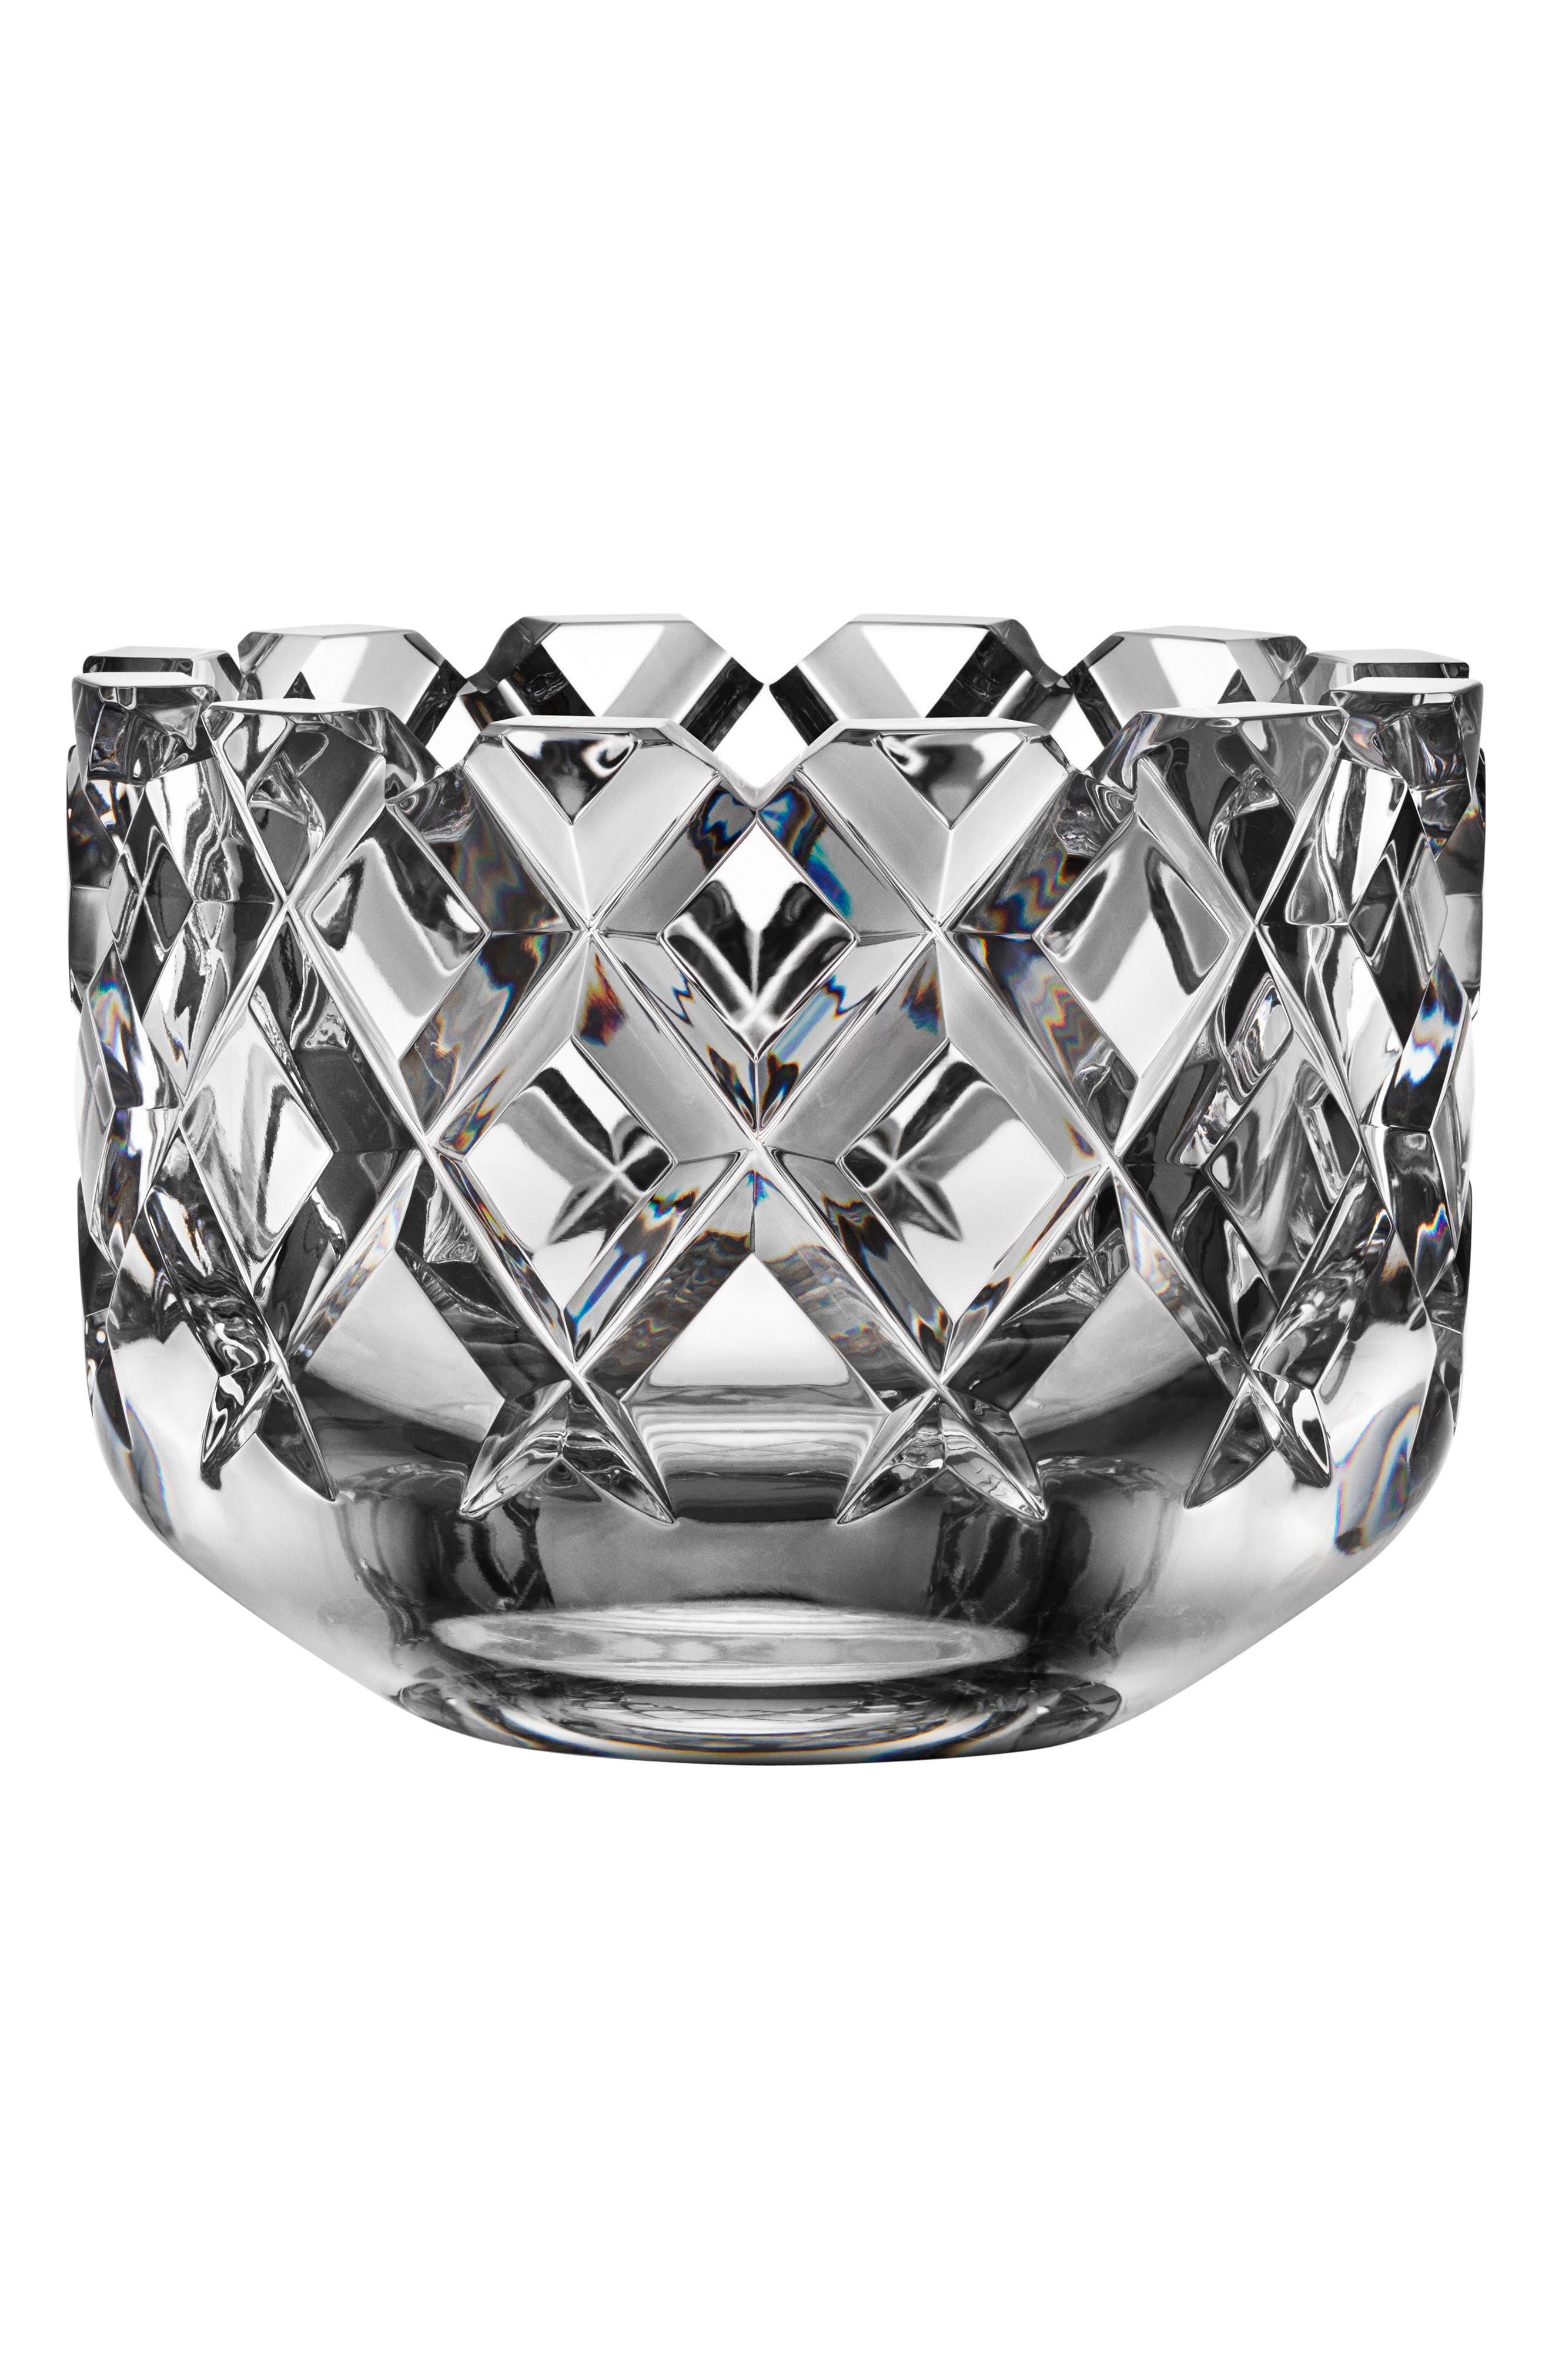 Sofiero Medium Crystal Bowl,                             Main thumbnail 1, color,                             CLEAR